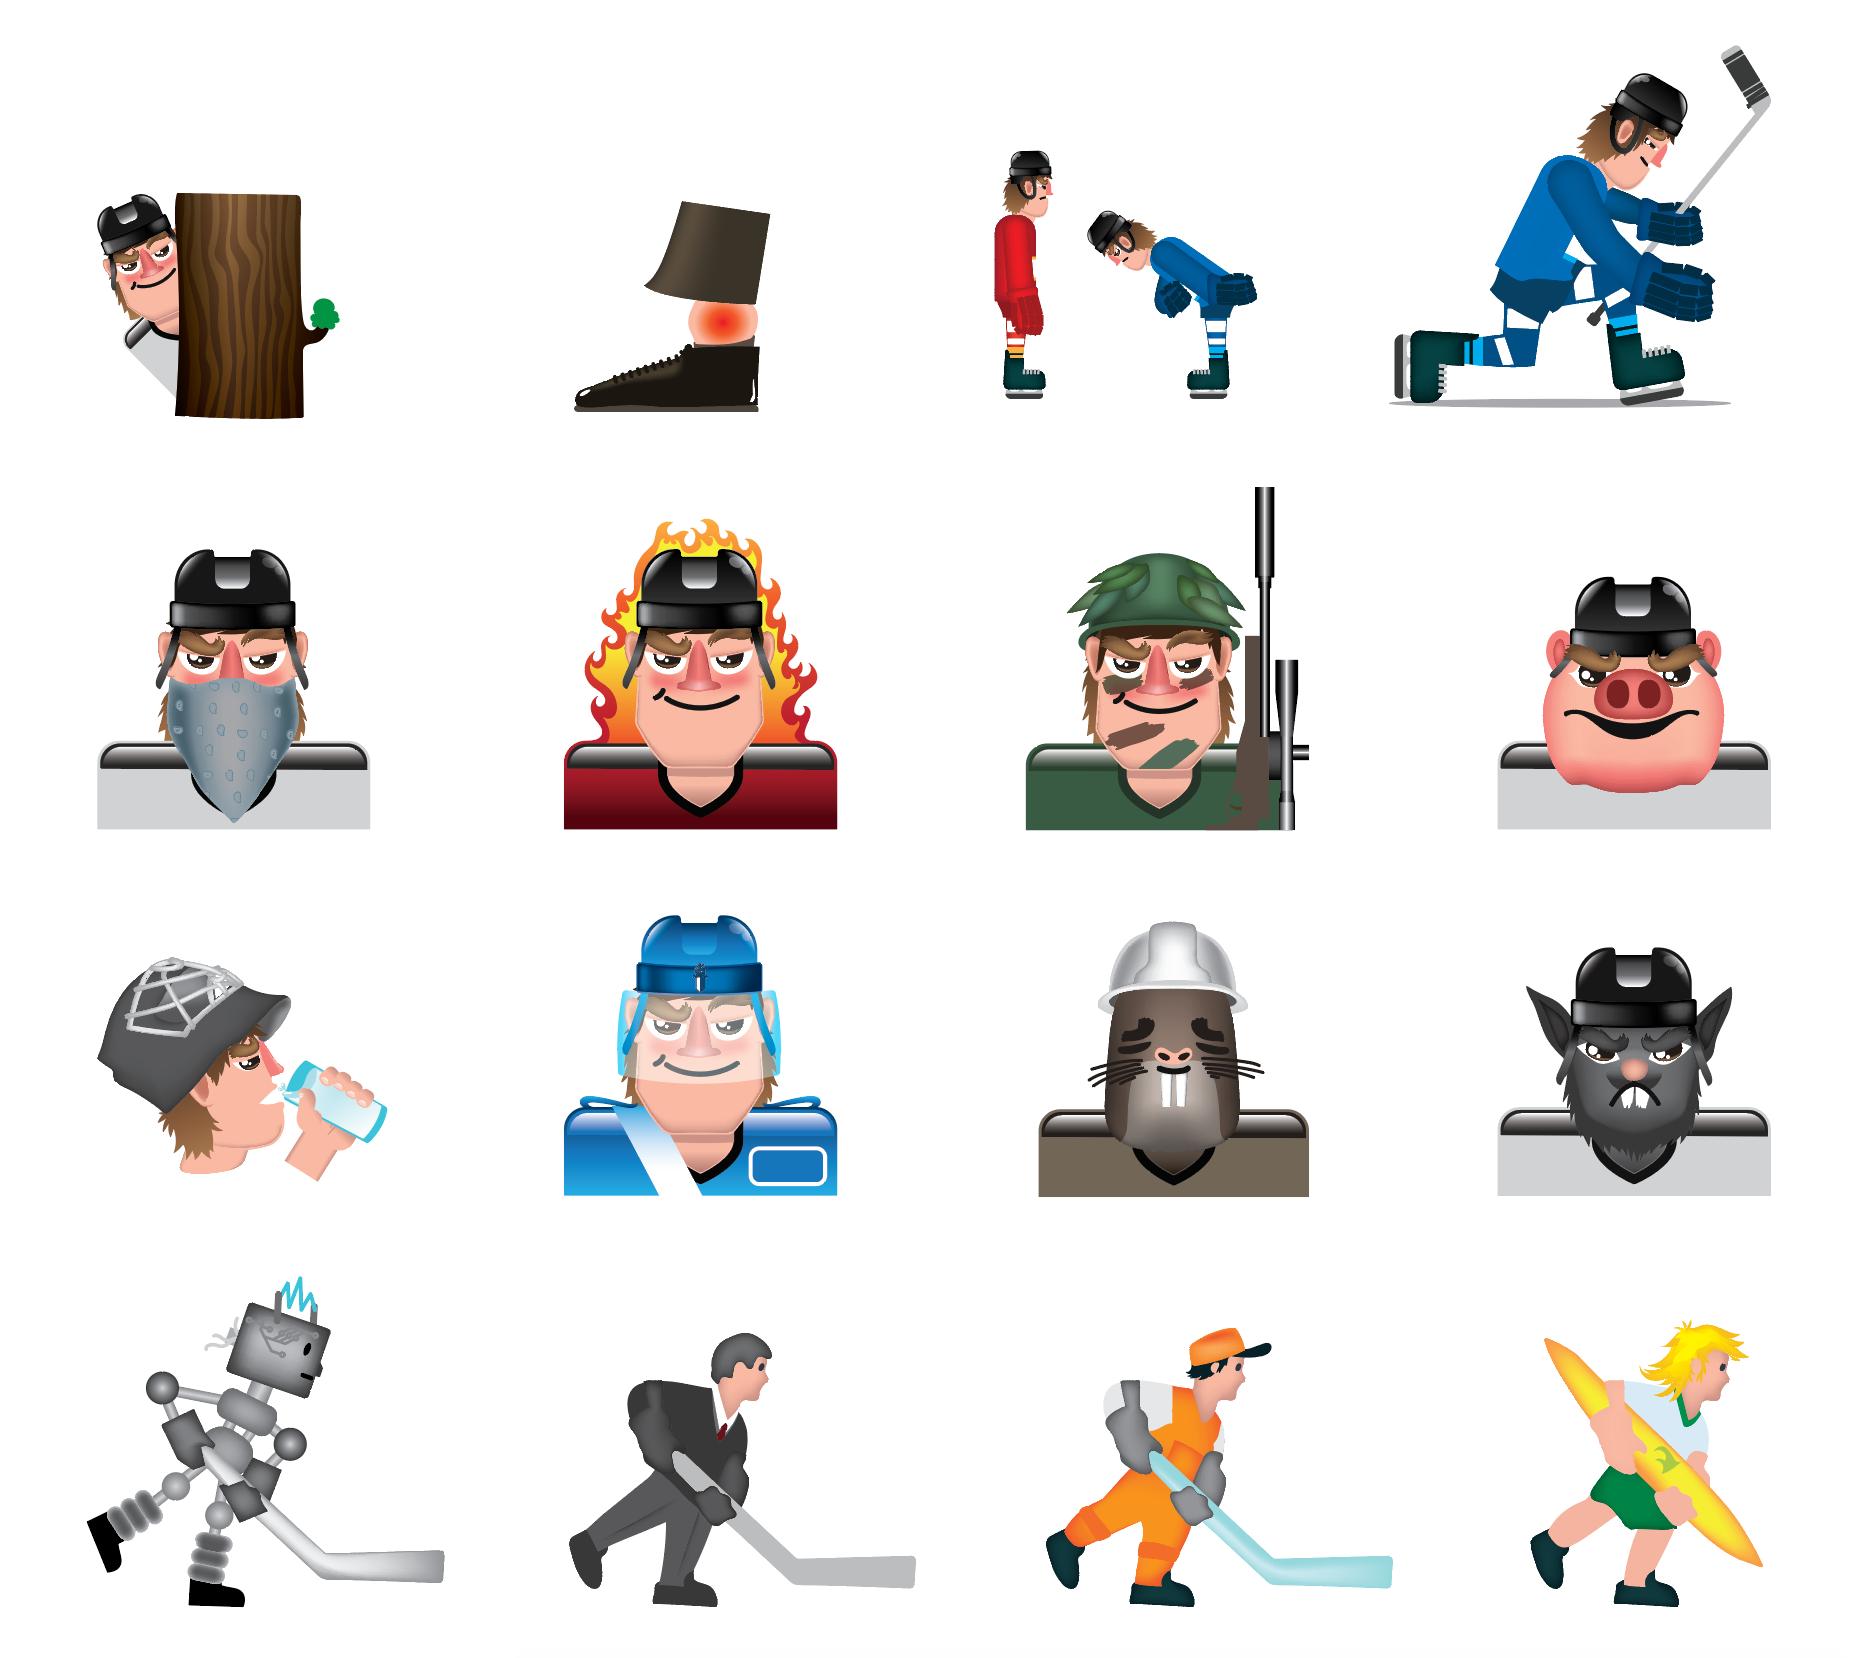 Illustrations of Ossi Pirkonen - Ice Hockey Emoji's